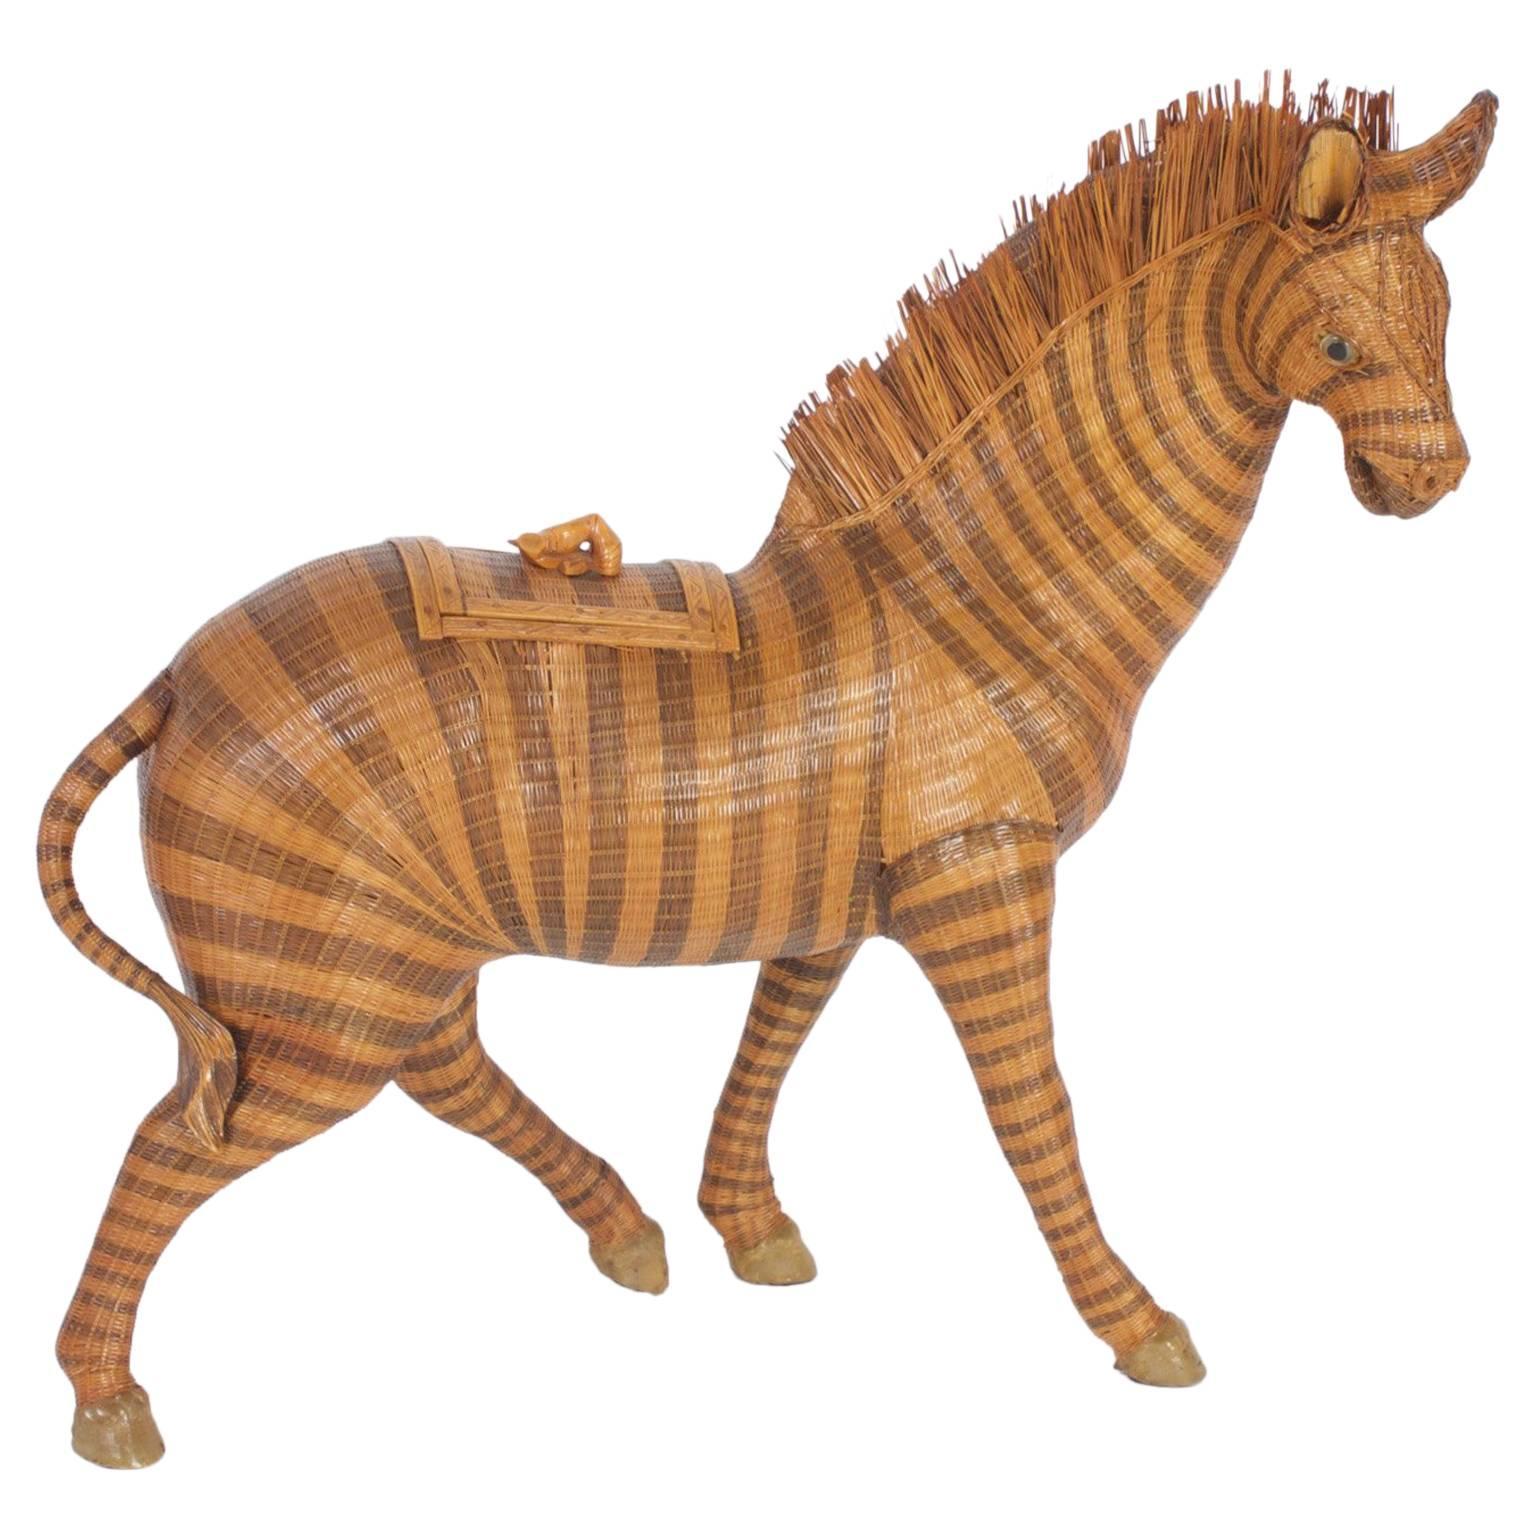 Woven Wicker Zebra Box